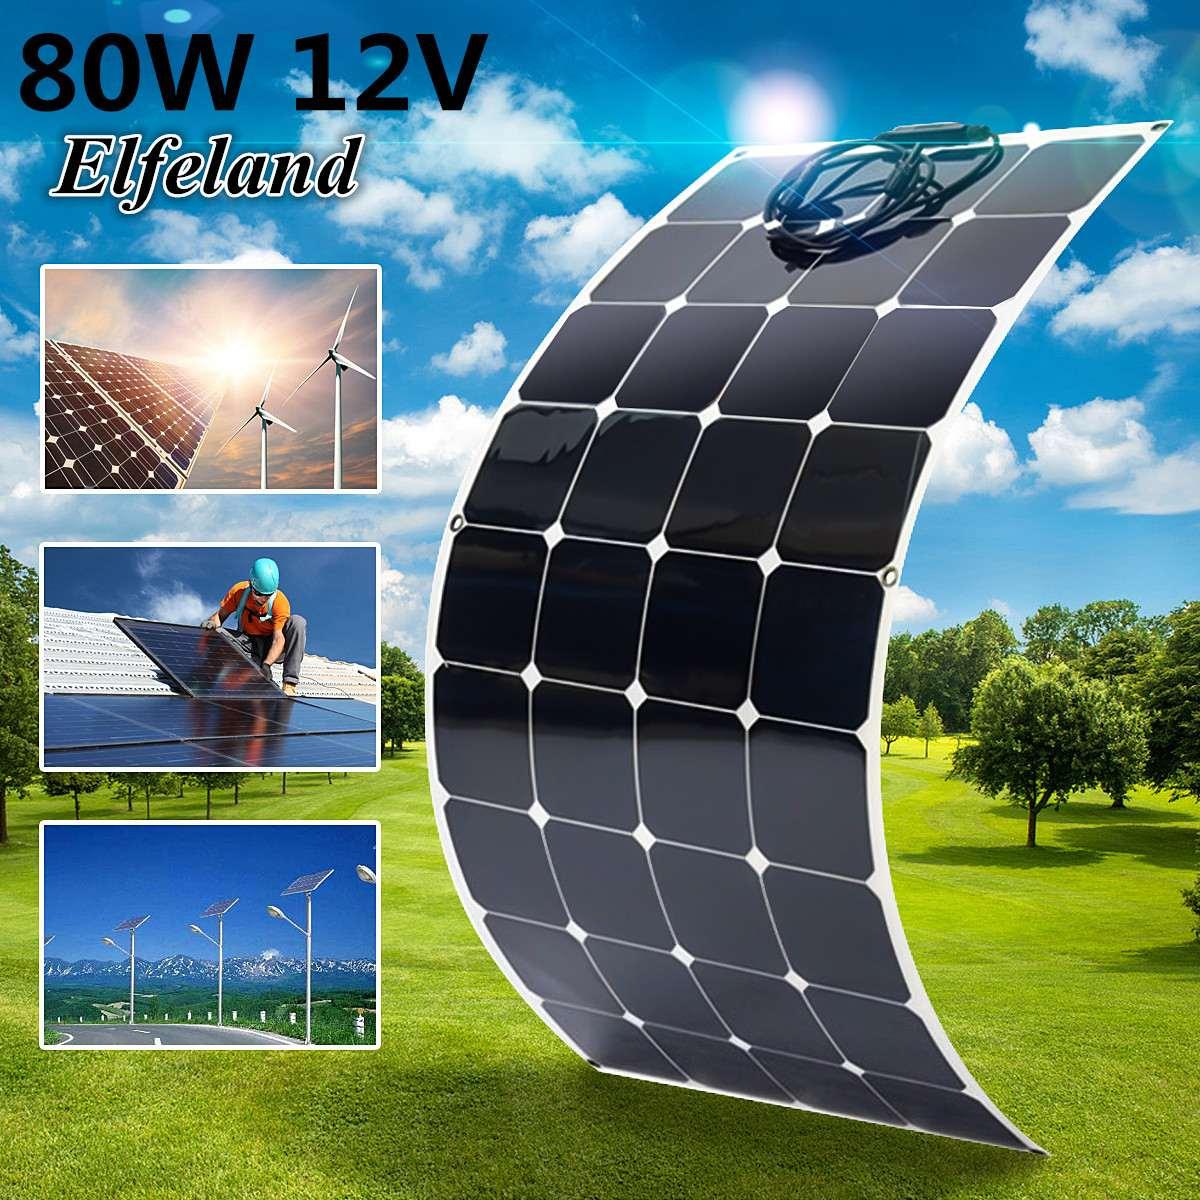 KINCO 80W 12V Semi Flexible Monocrystalline Sun Power Chip Solar Panel High Conversion Efficiency For RV Boat Car + 1.5m Cable